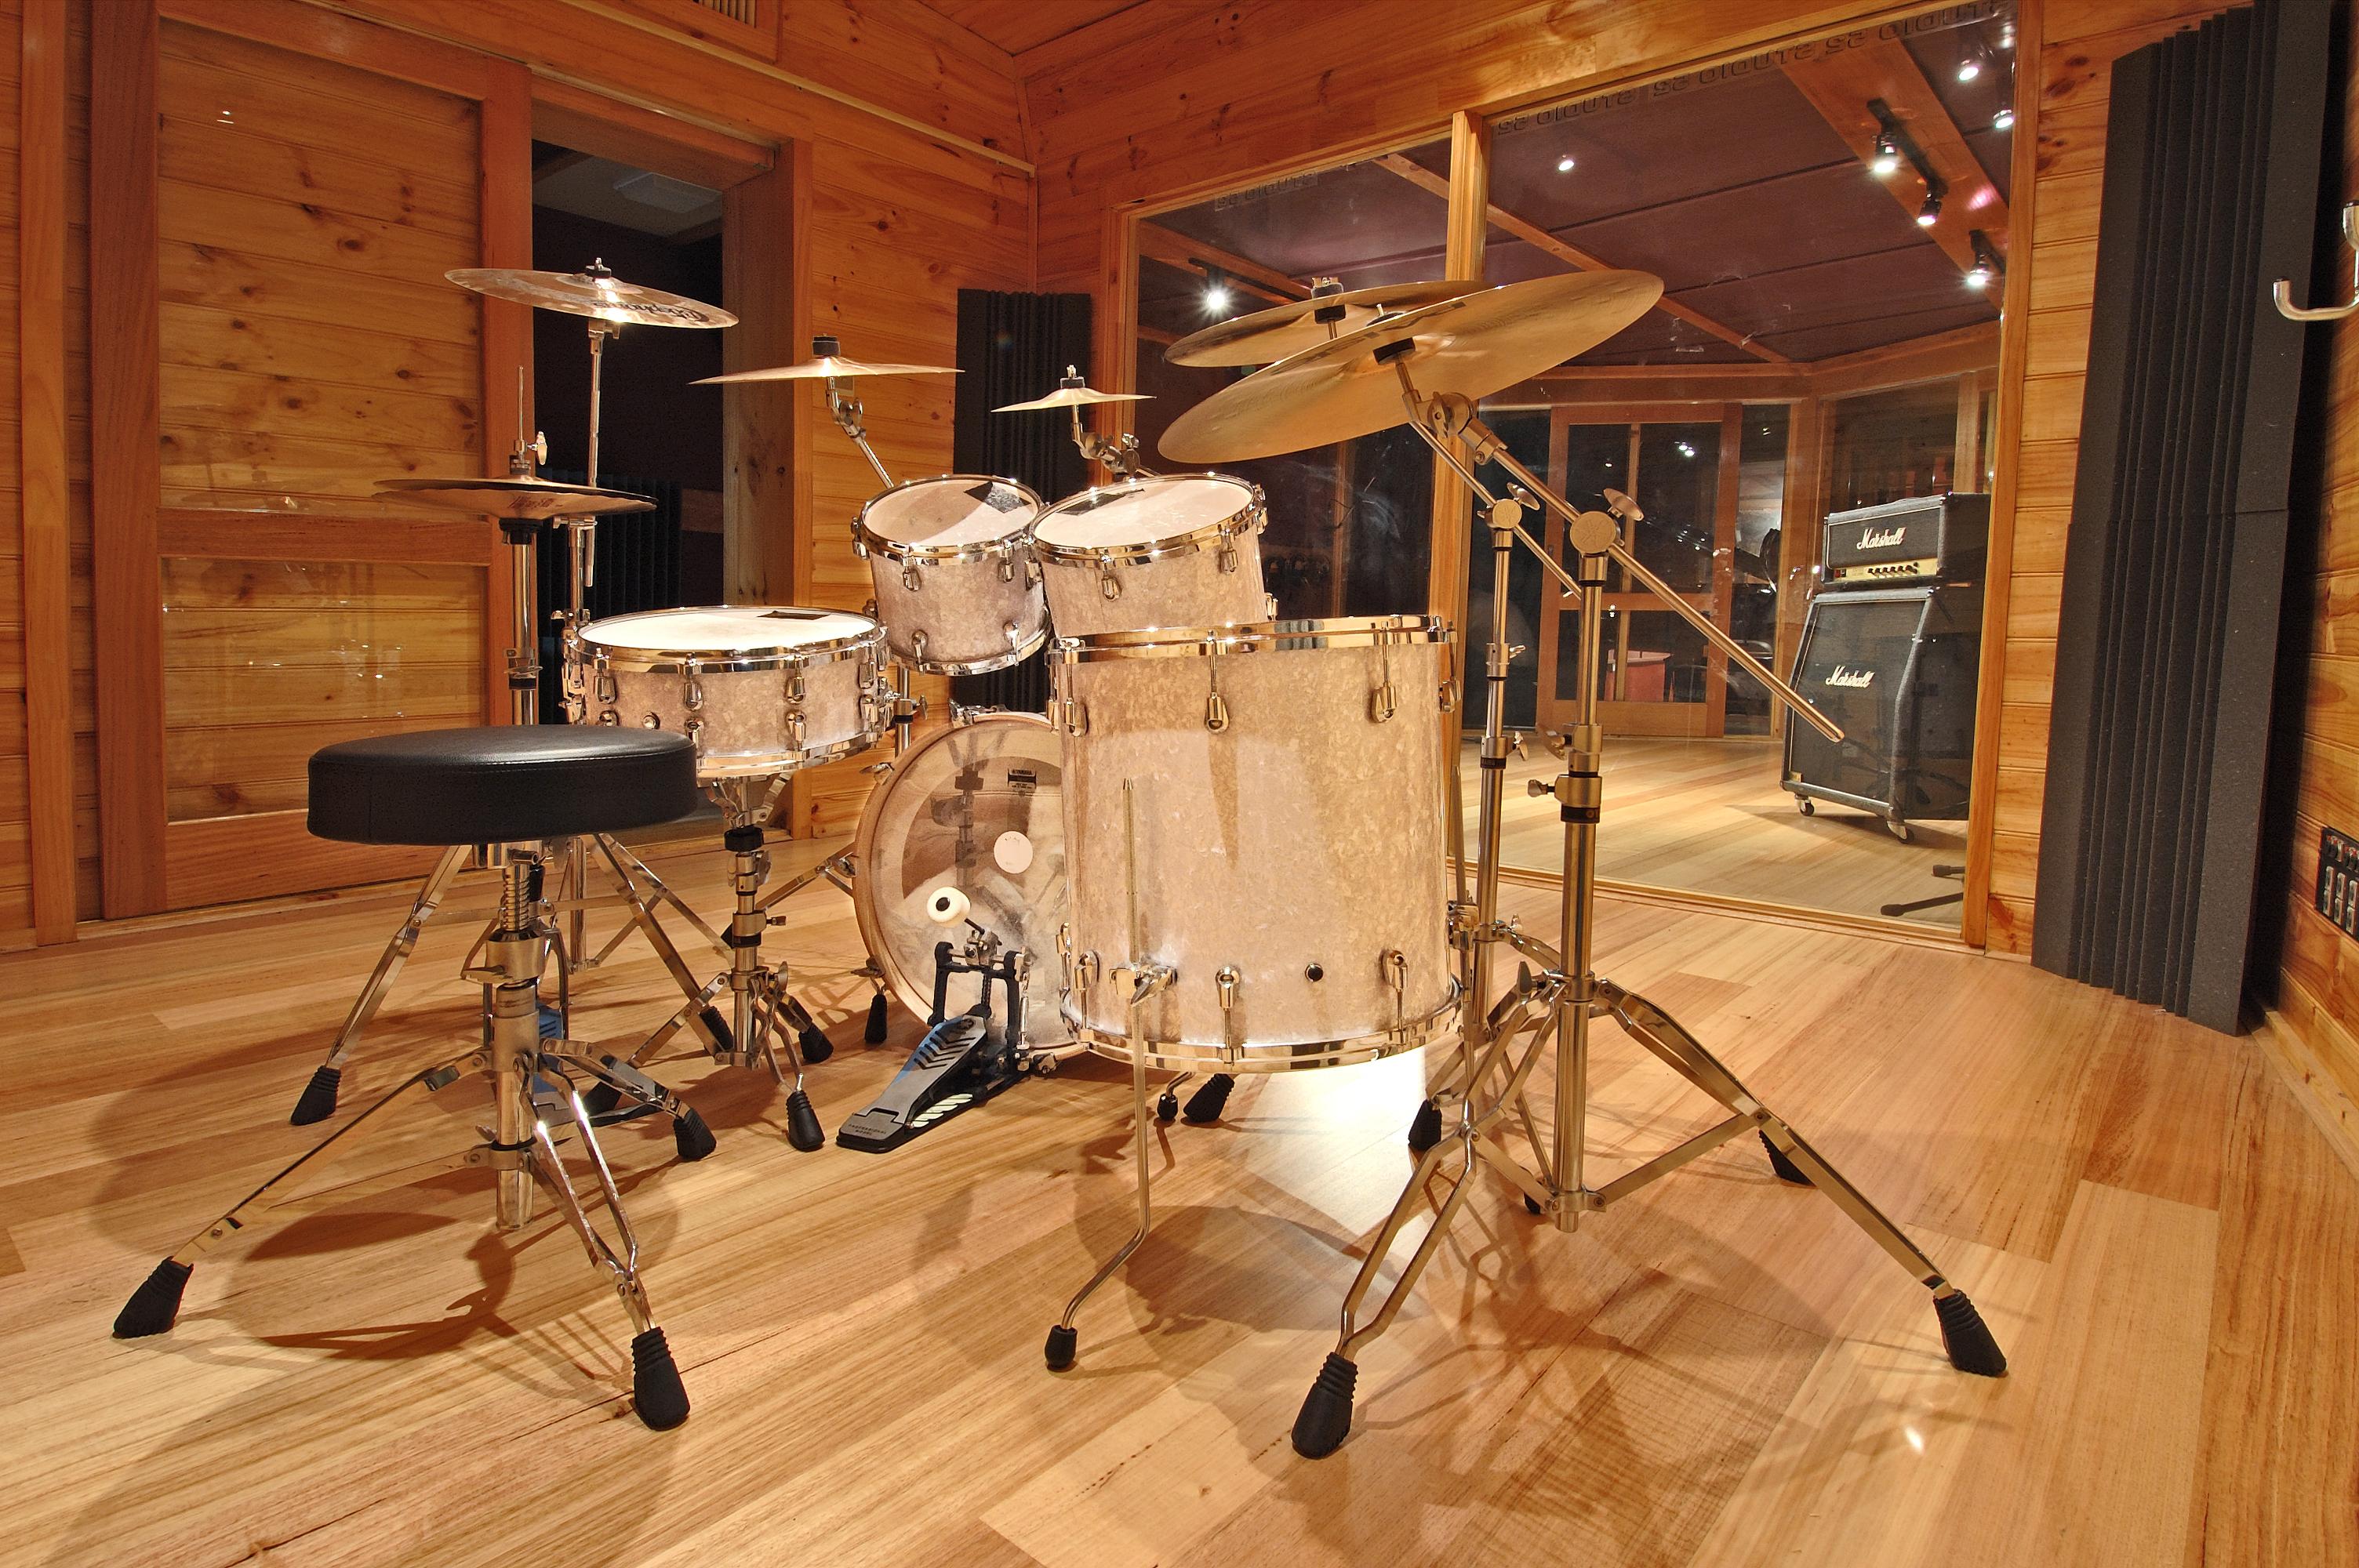 Marine Pearl Yamaha drums